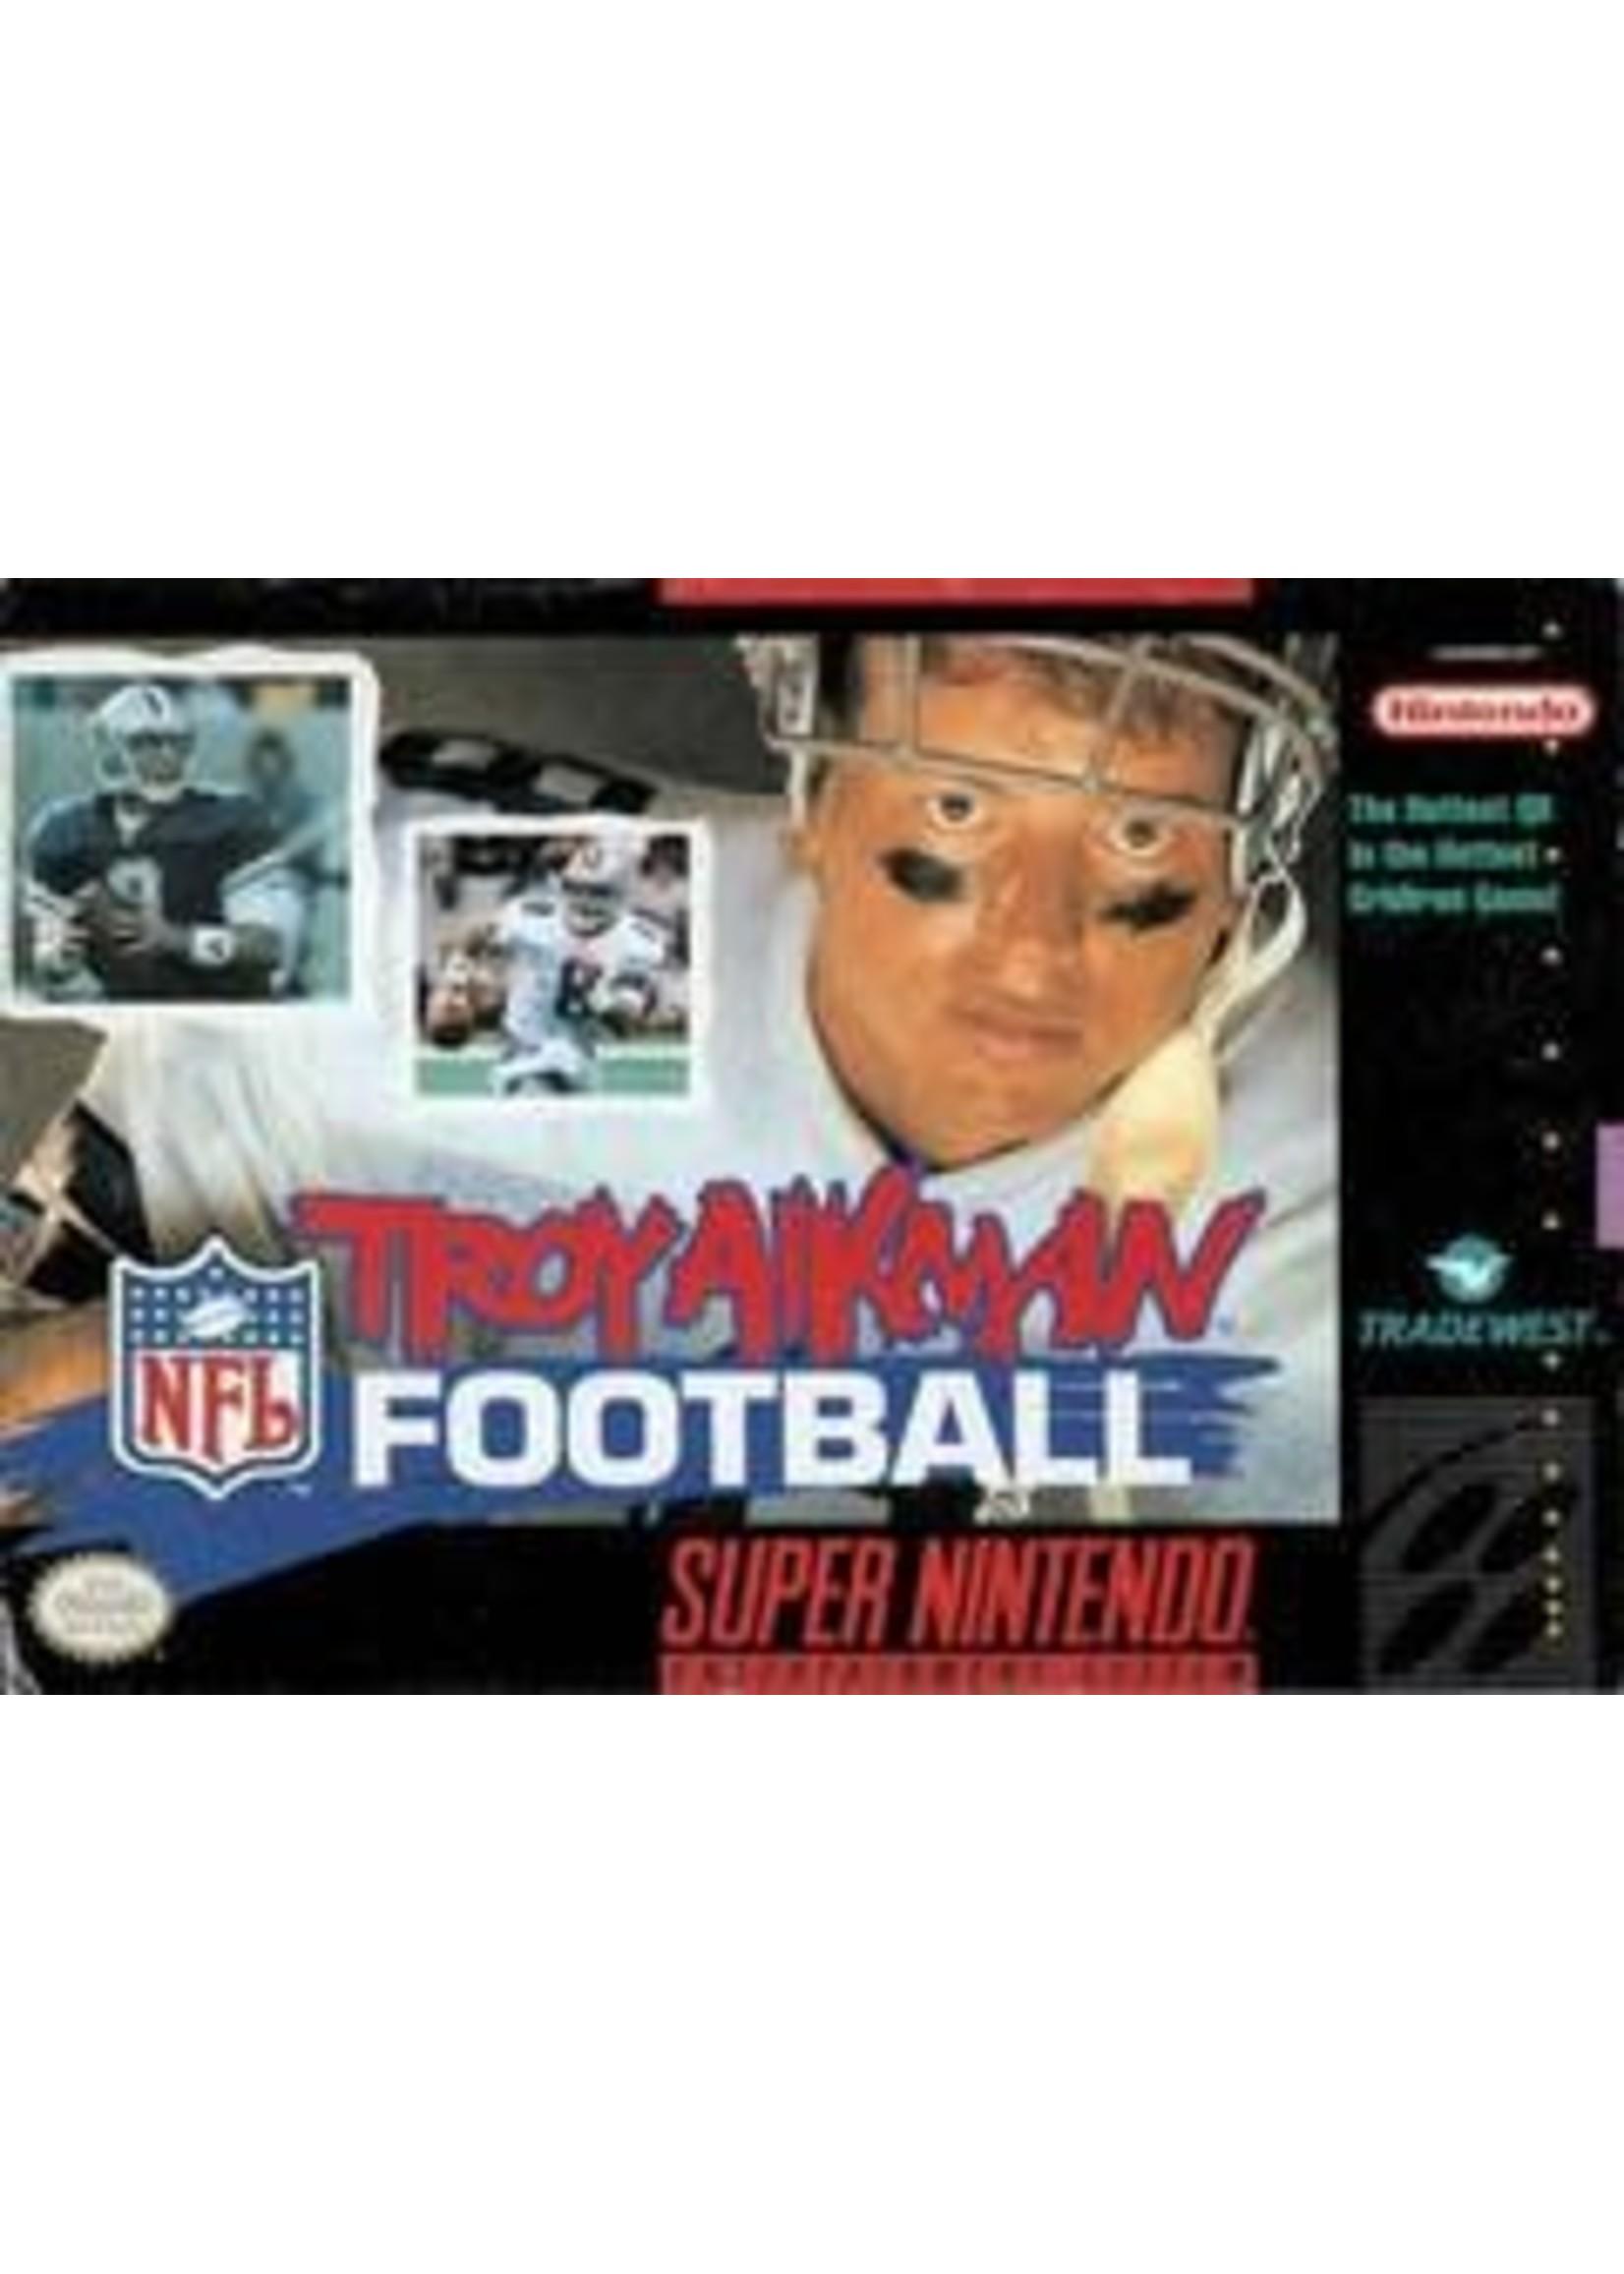 Troy Aikman NFL Football Super Nintendo